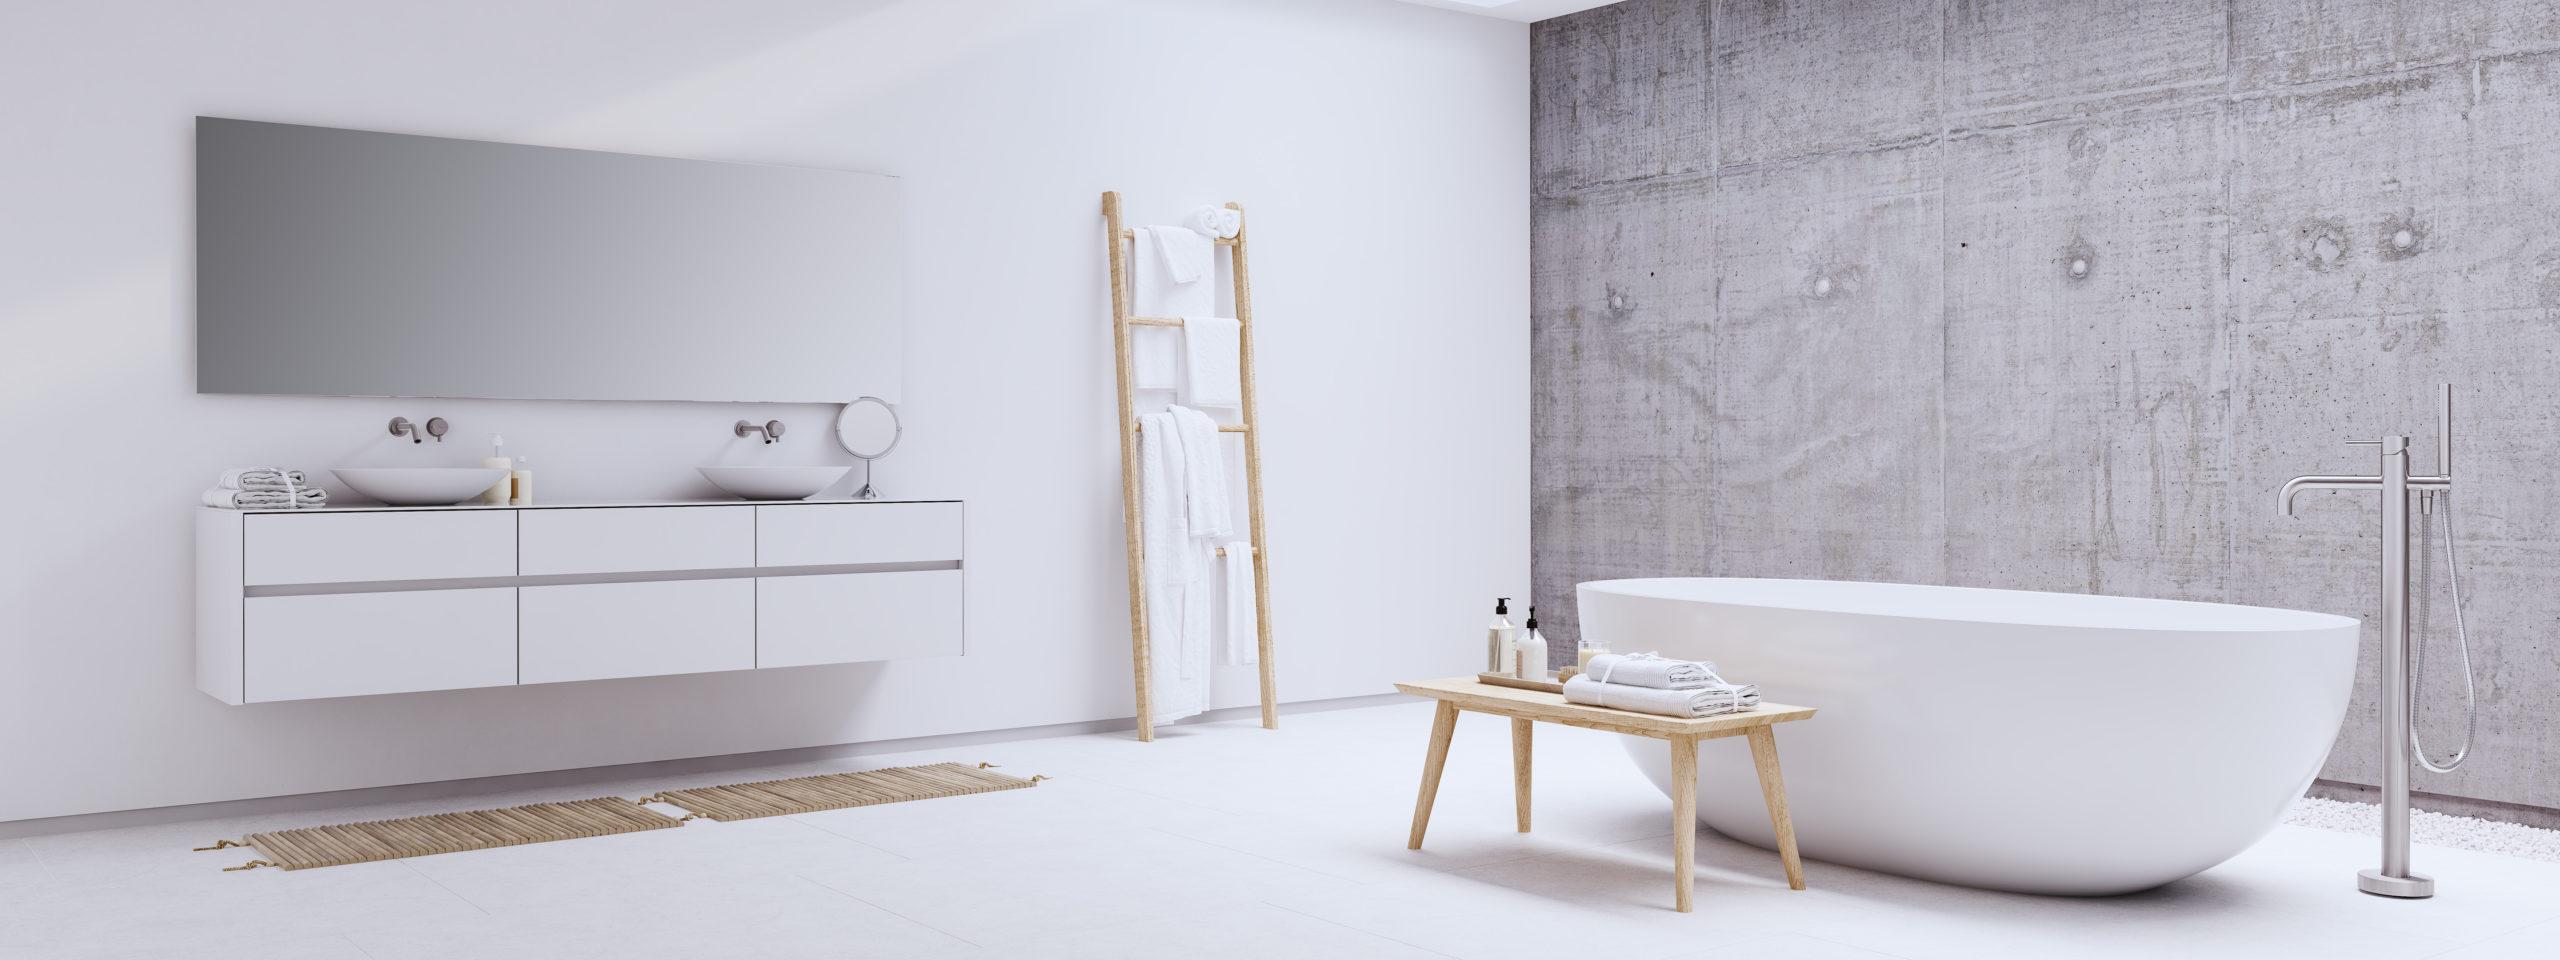 commercial-bath-refinishing-01